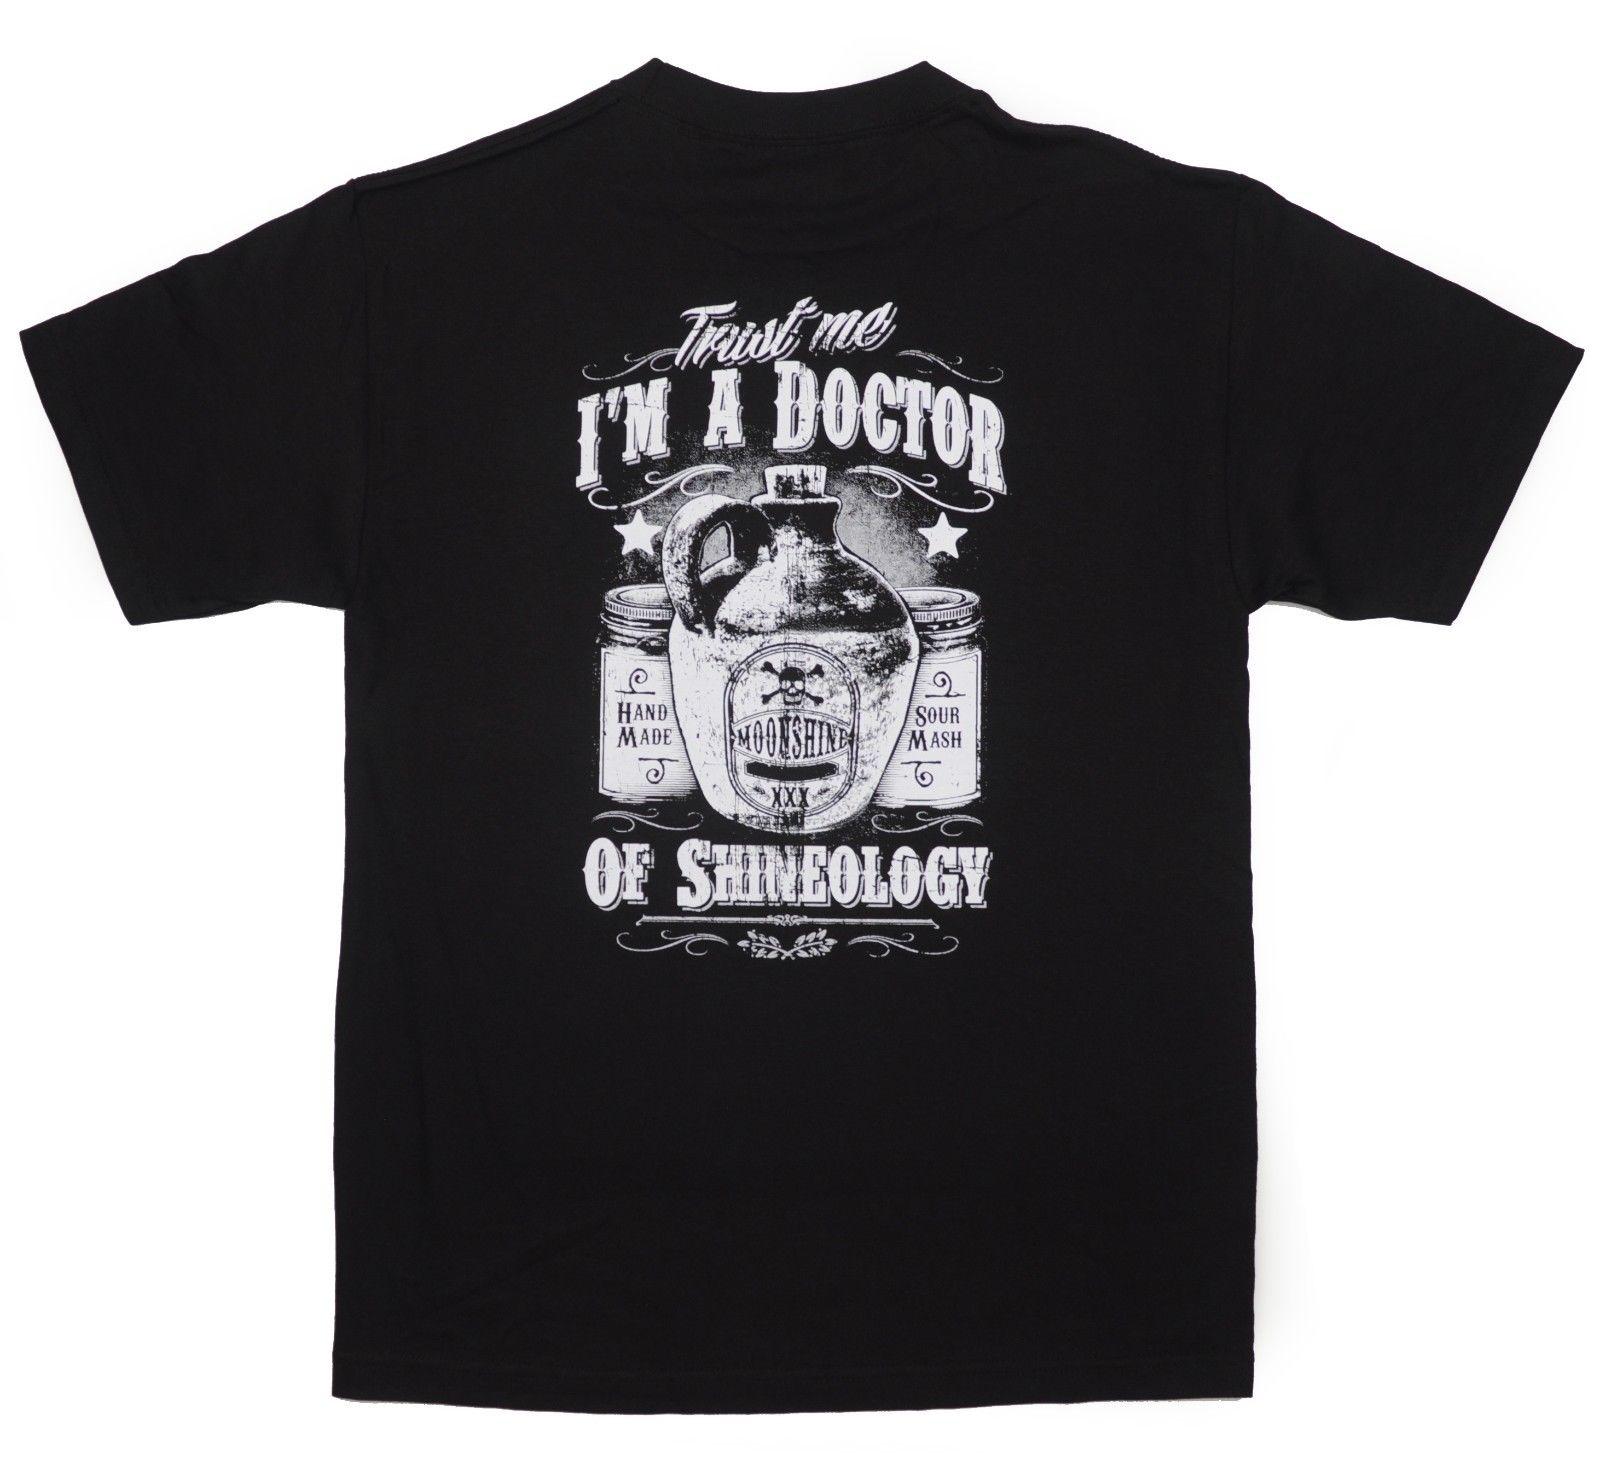 2018 Stile di Estate di Modo Moonshine Whisky T-Shirt Nera Medico Shineology Rye Americano Ha Fatto Del Cranio BABA Tee shirt